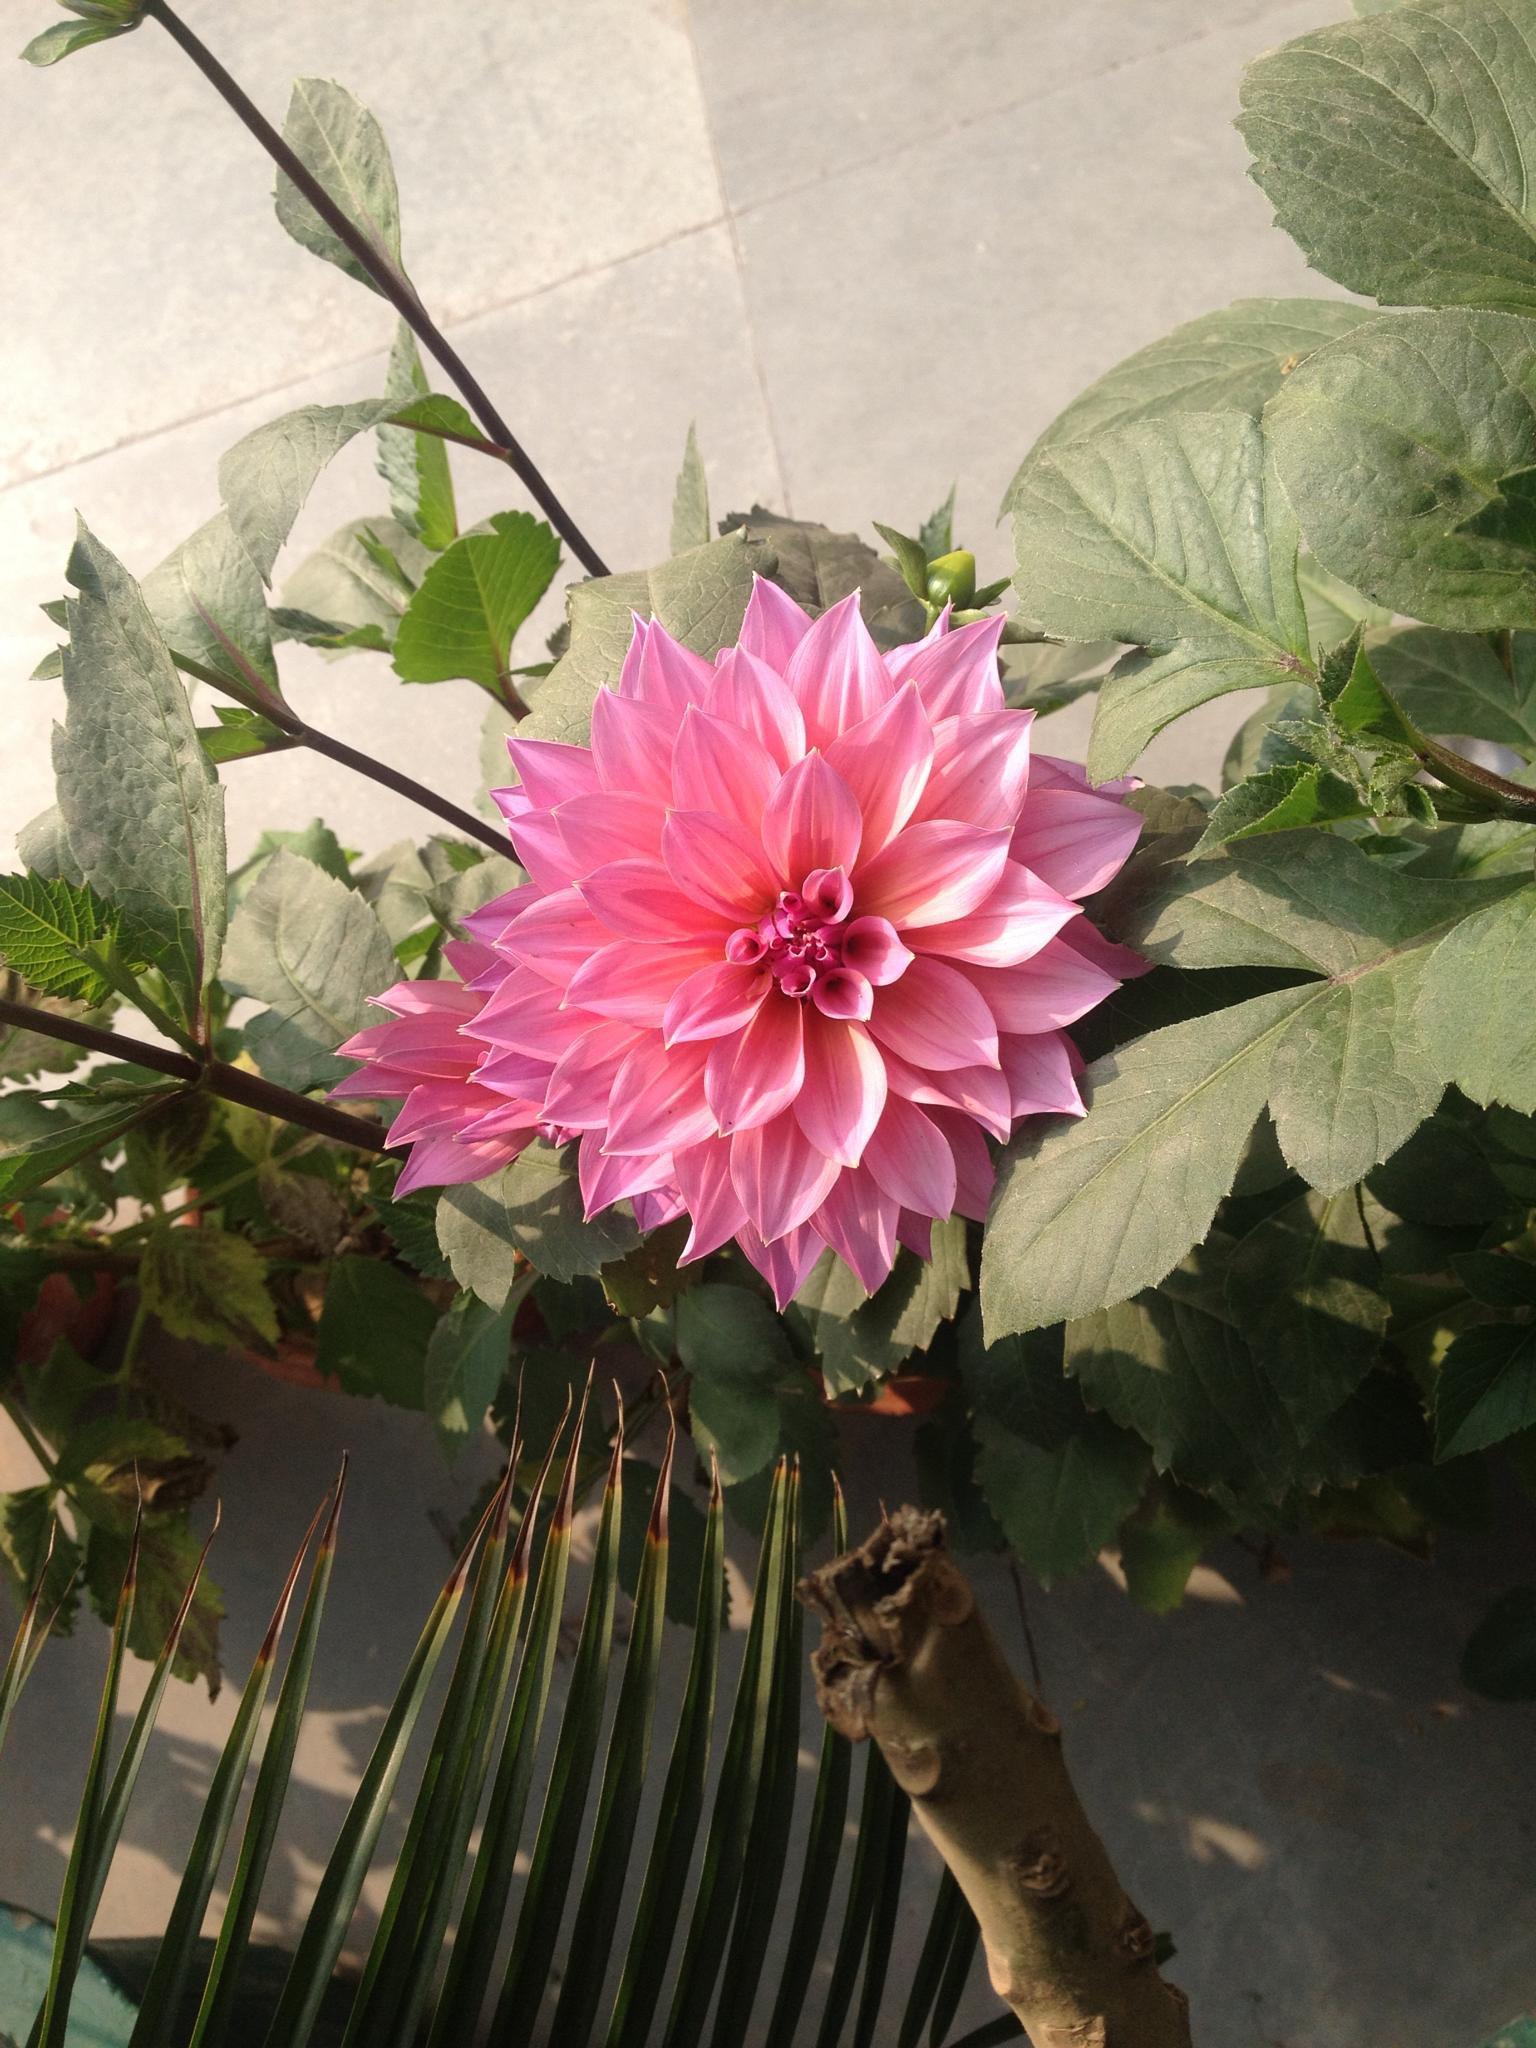 Flower by Shubham Gautam